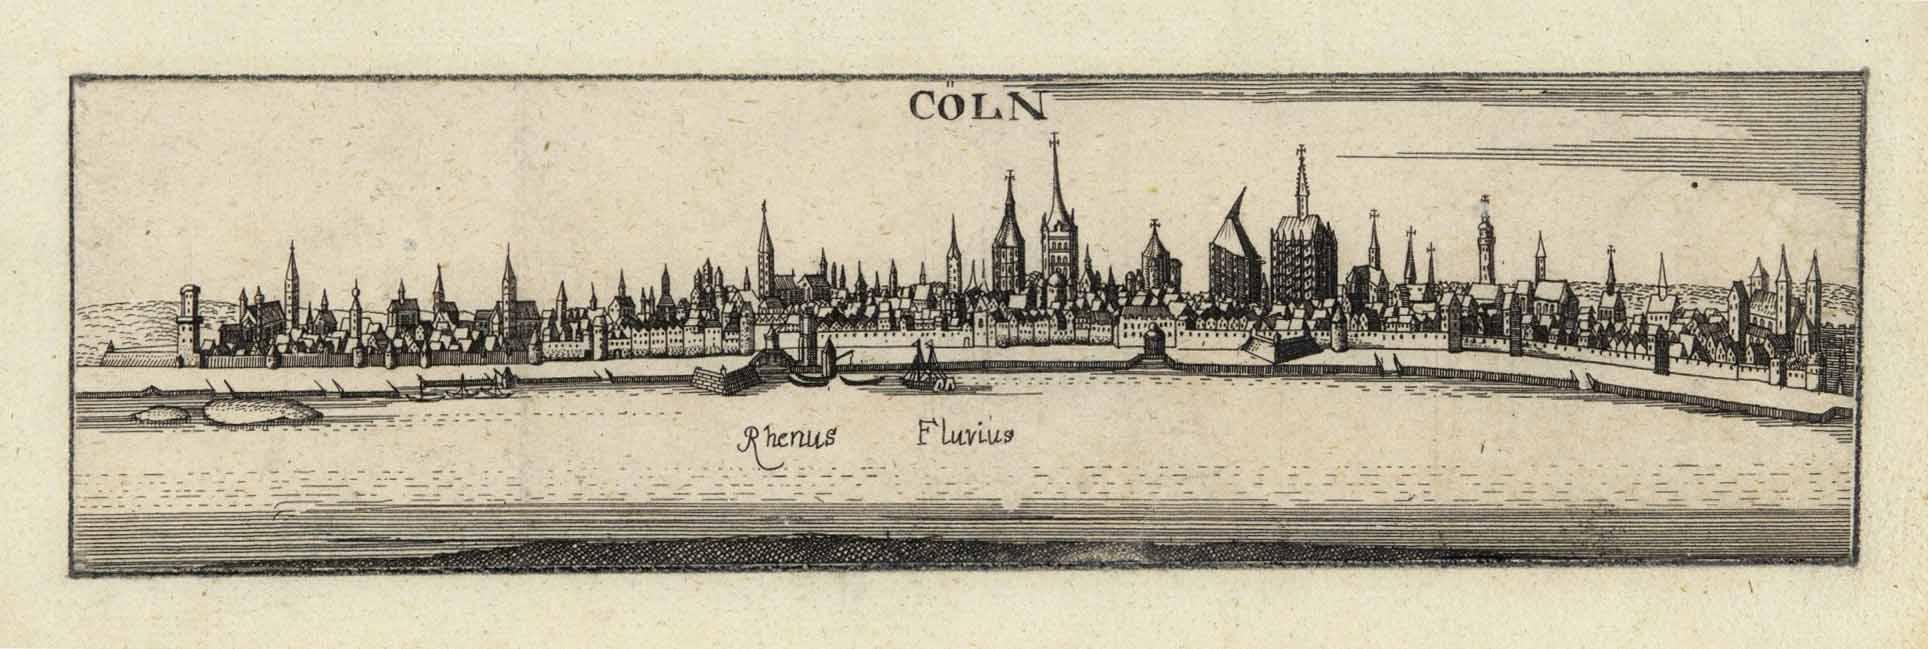 Gesamtansicht über den Rhein ('Cöln - Rhenus: KÖLN: